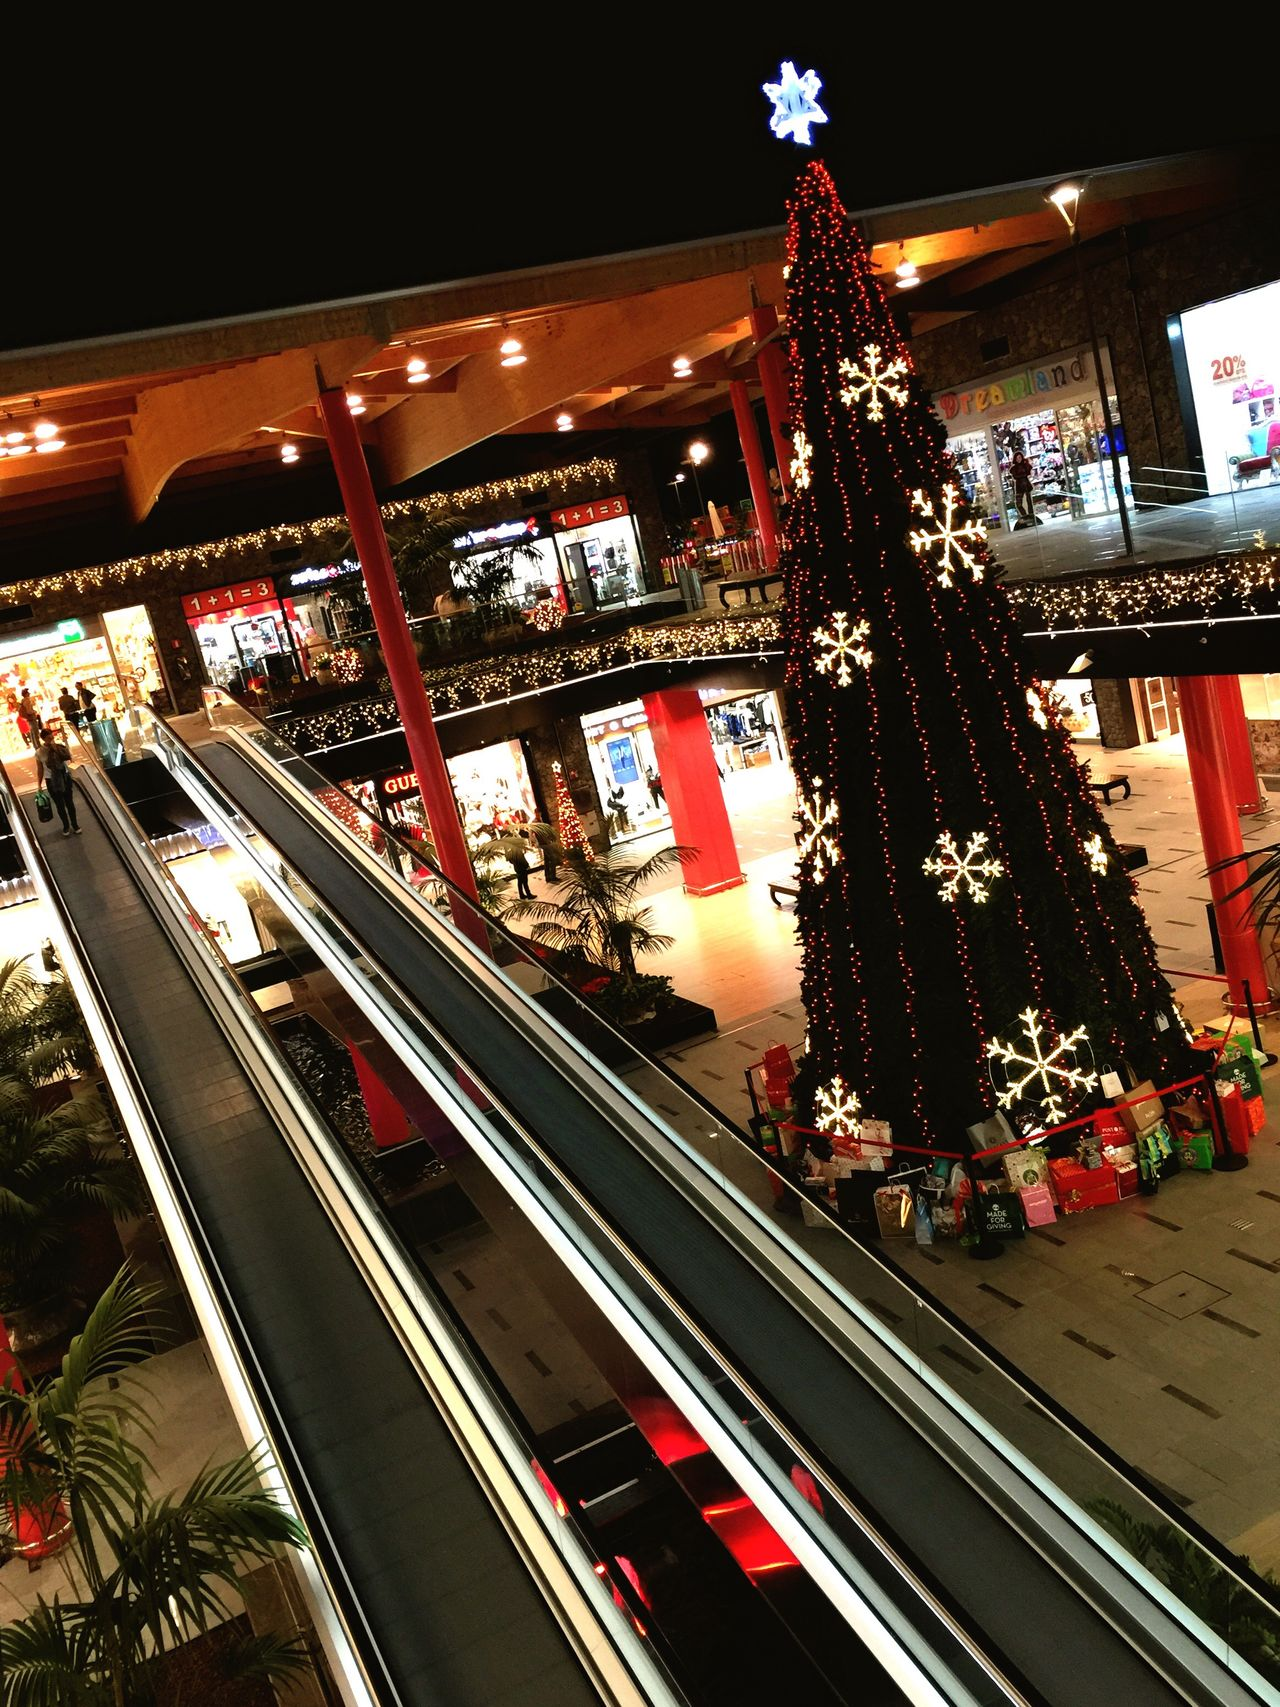 Siam Tenerife Teneriffa Navidad Canarias Canary Islands Mall Shopping Mall Siammall Christmas Tree Christmastime Christmas Lights Christmas Decorations Christmastree Christmas Time